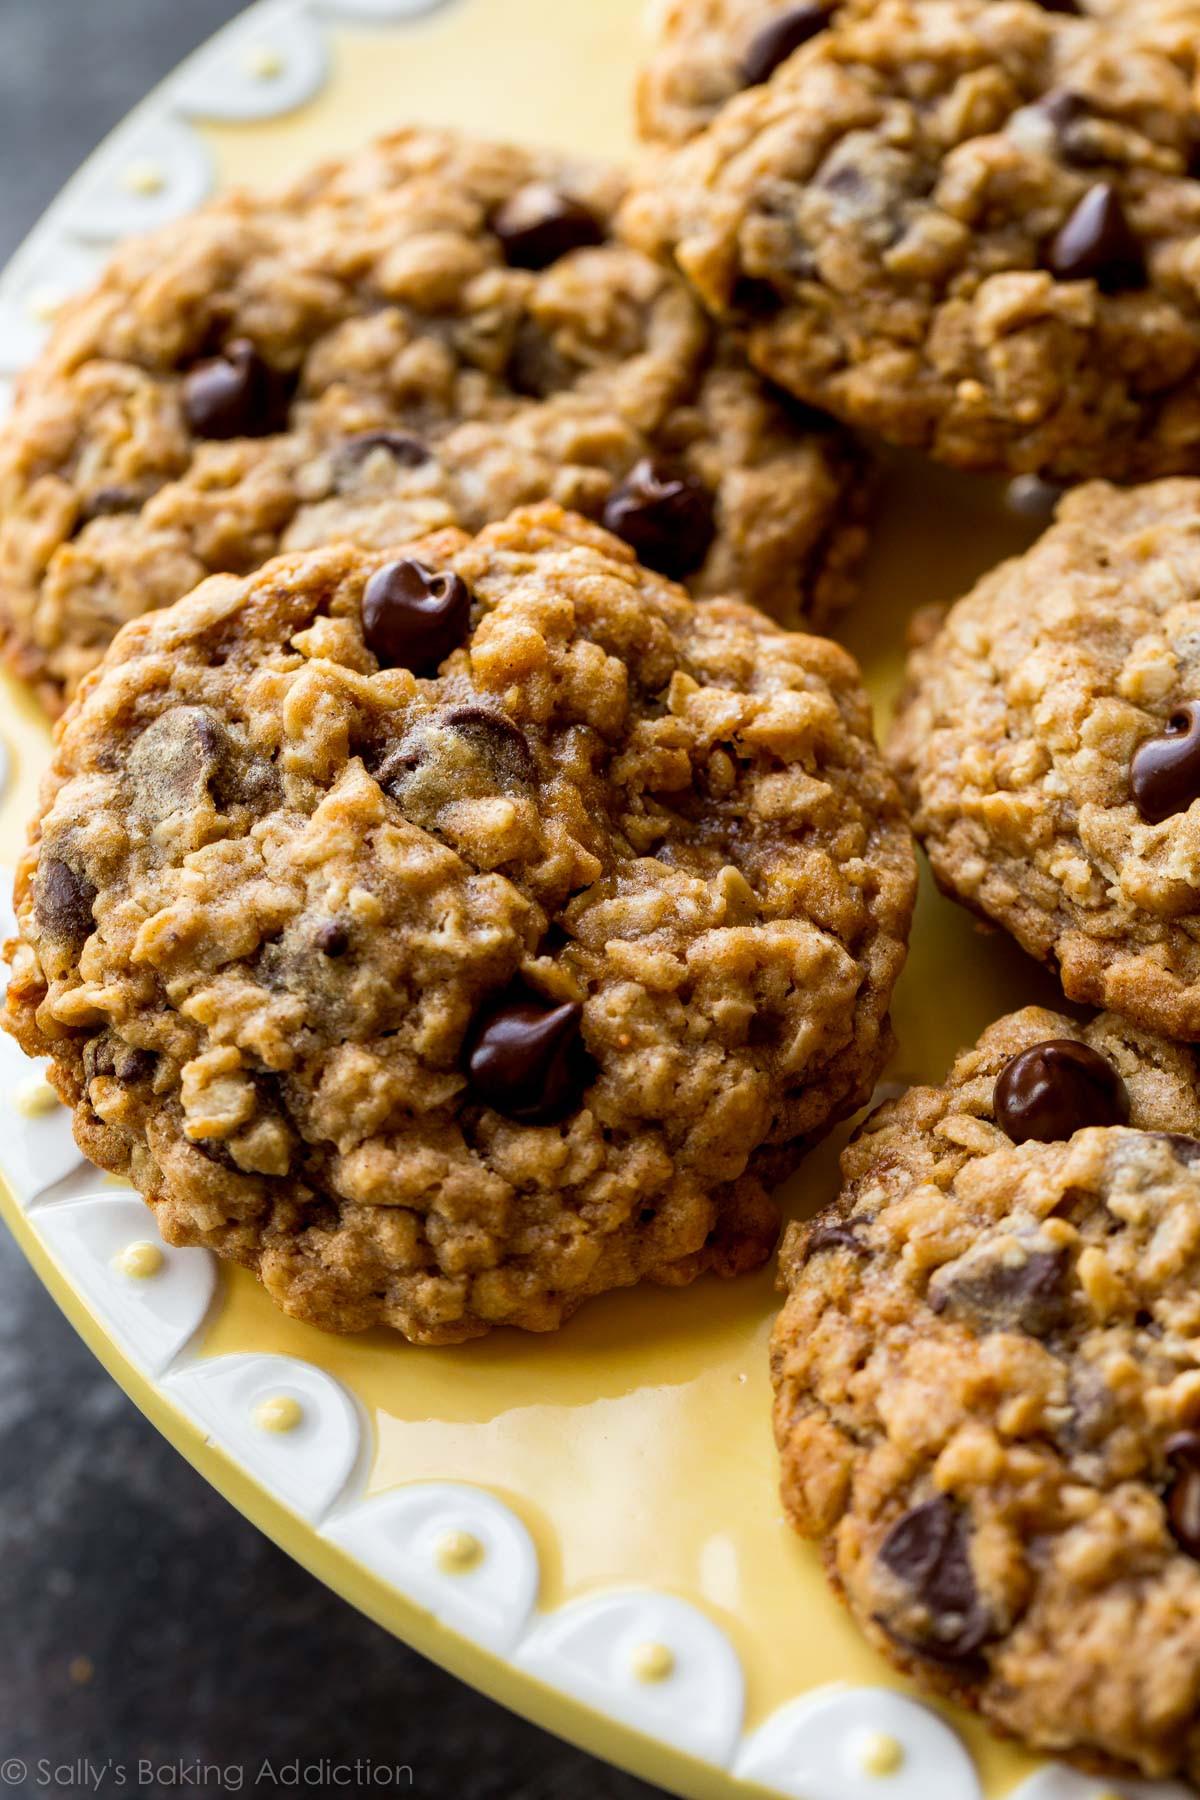 Healthy Oatmeal Raisin Chocolate Chip Cookies  Soft & Chewy Oatmeal Chocolate Chip Cookies Sallys